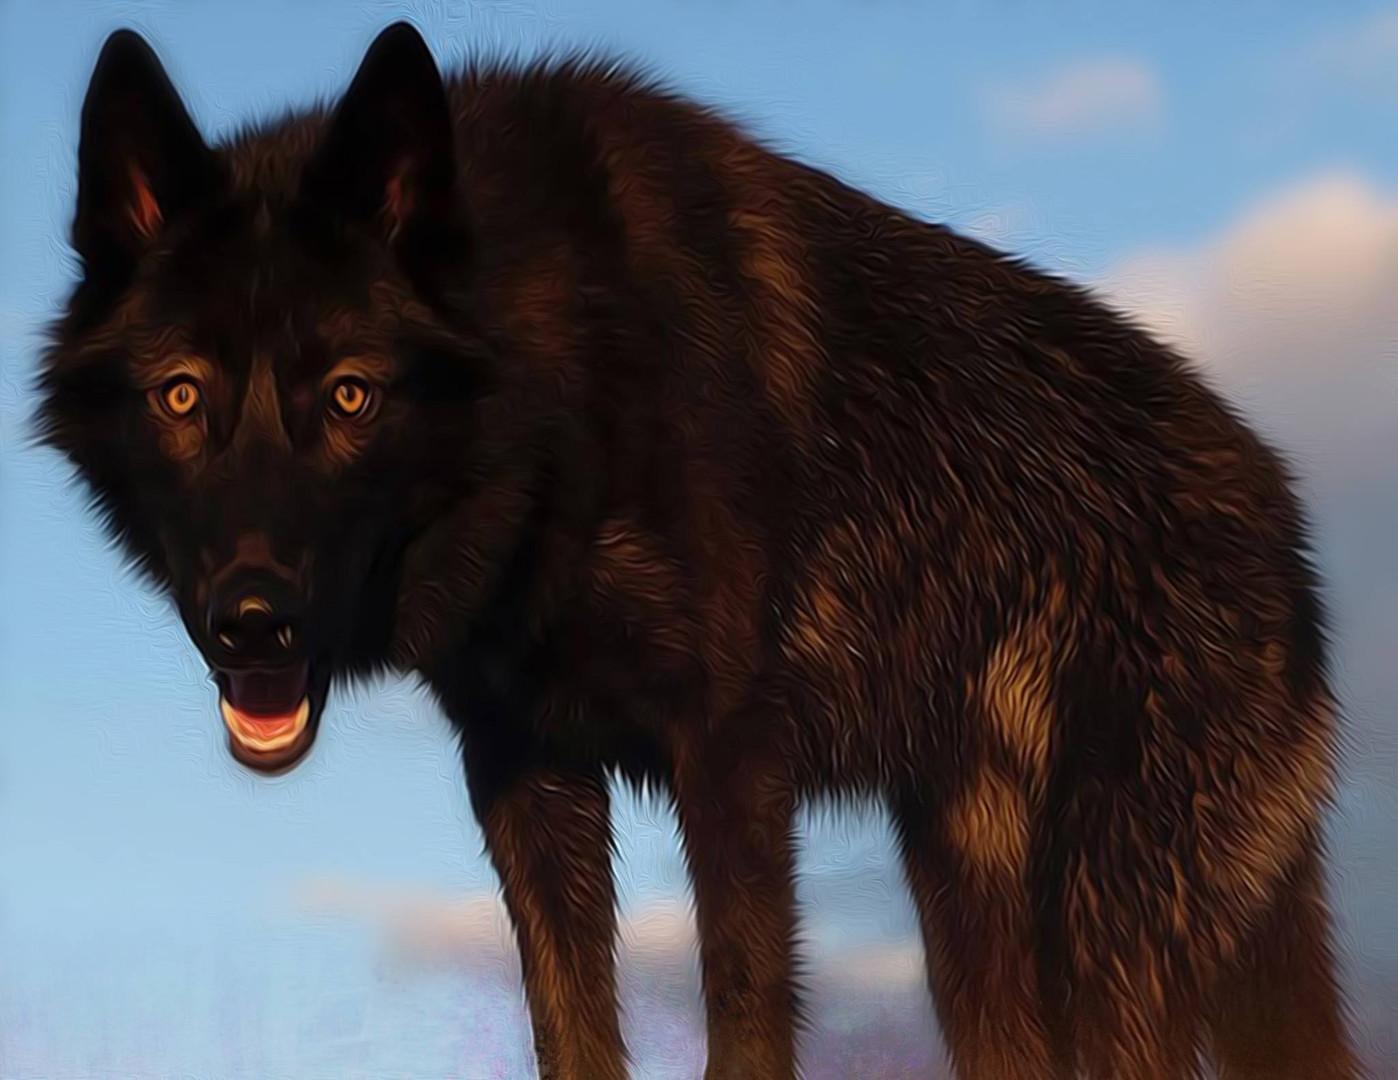 furiosa-the-wolfdog-in-NJ (16).jpg